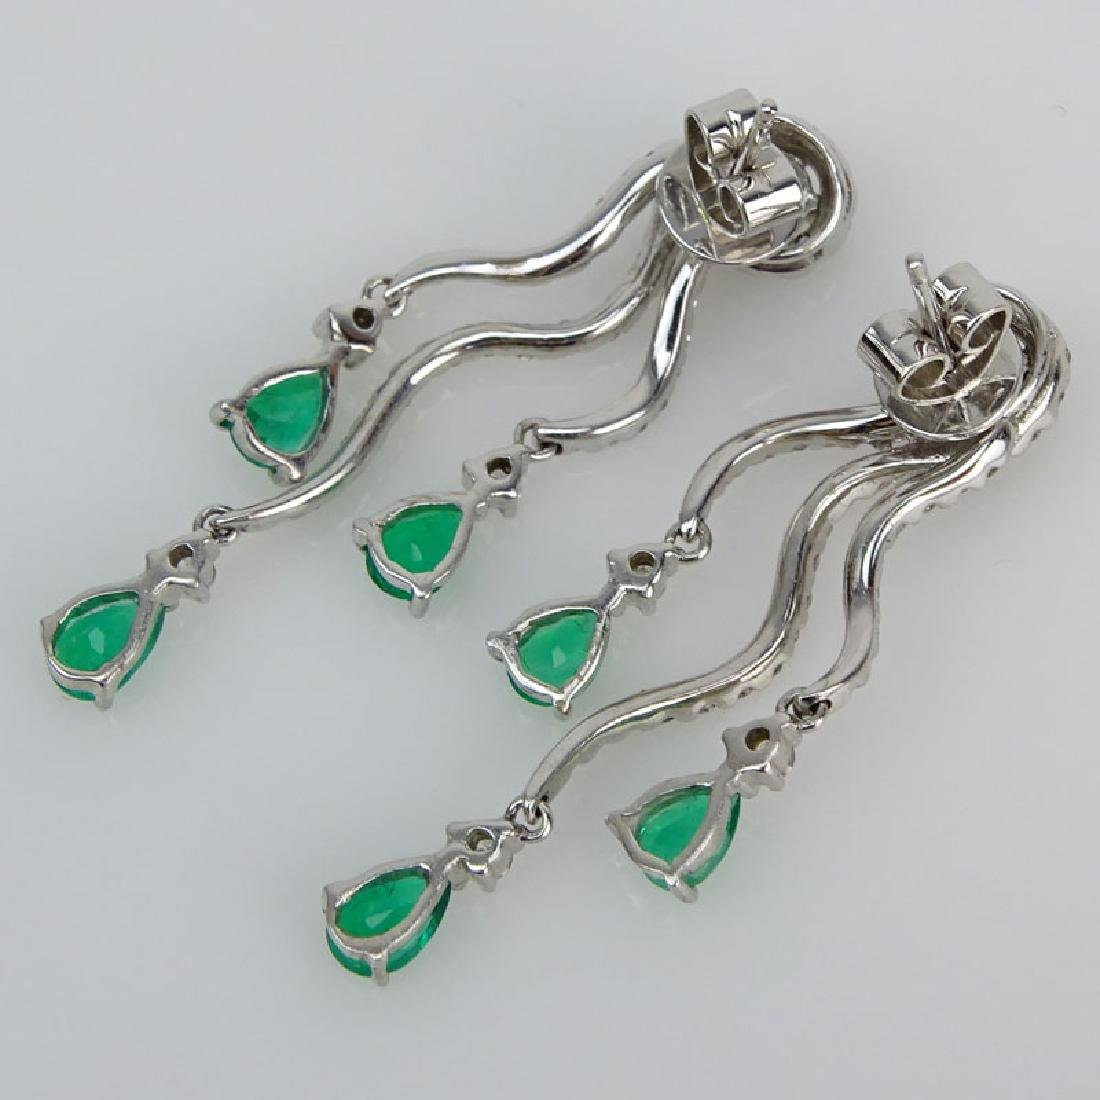 Approx. 1.80 Carat Pear Shape Emerald, 1.60 Carat Round - 2